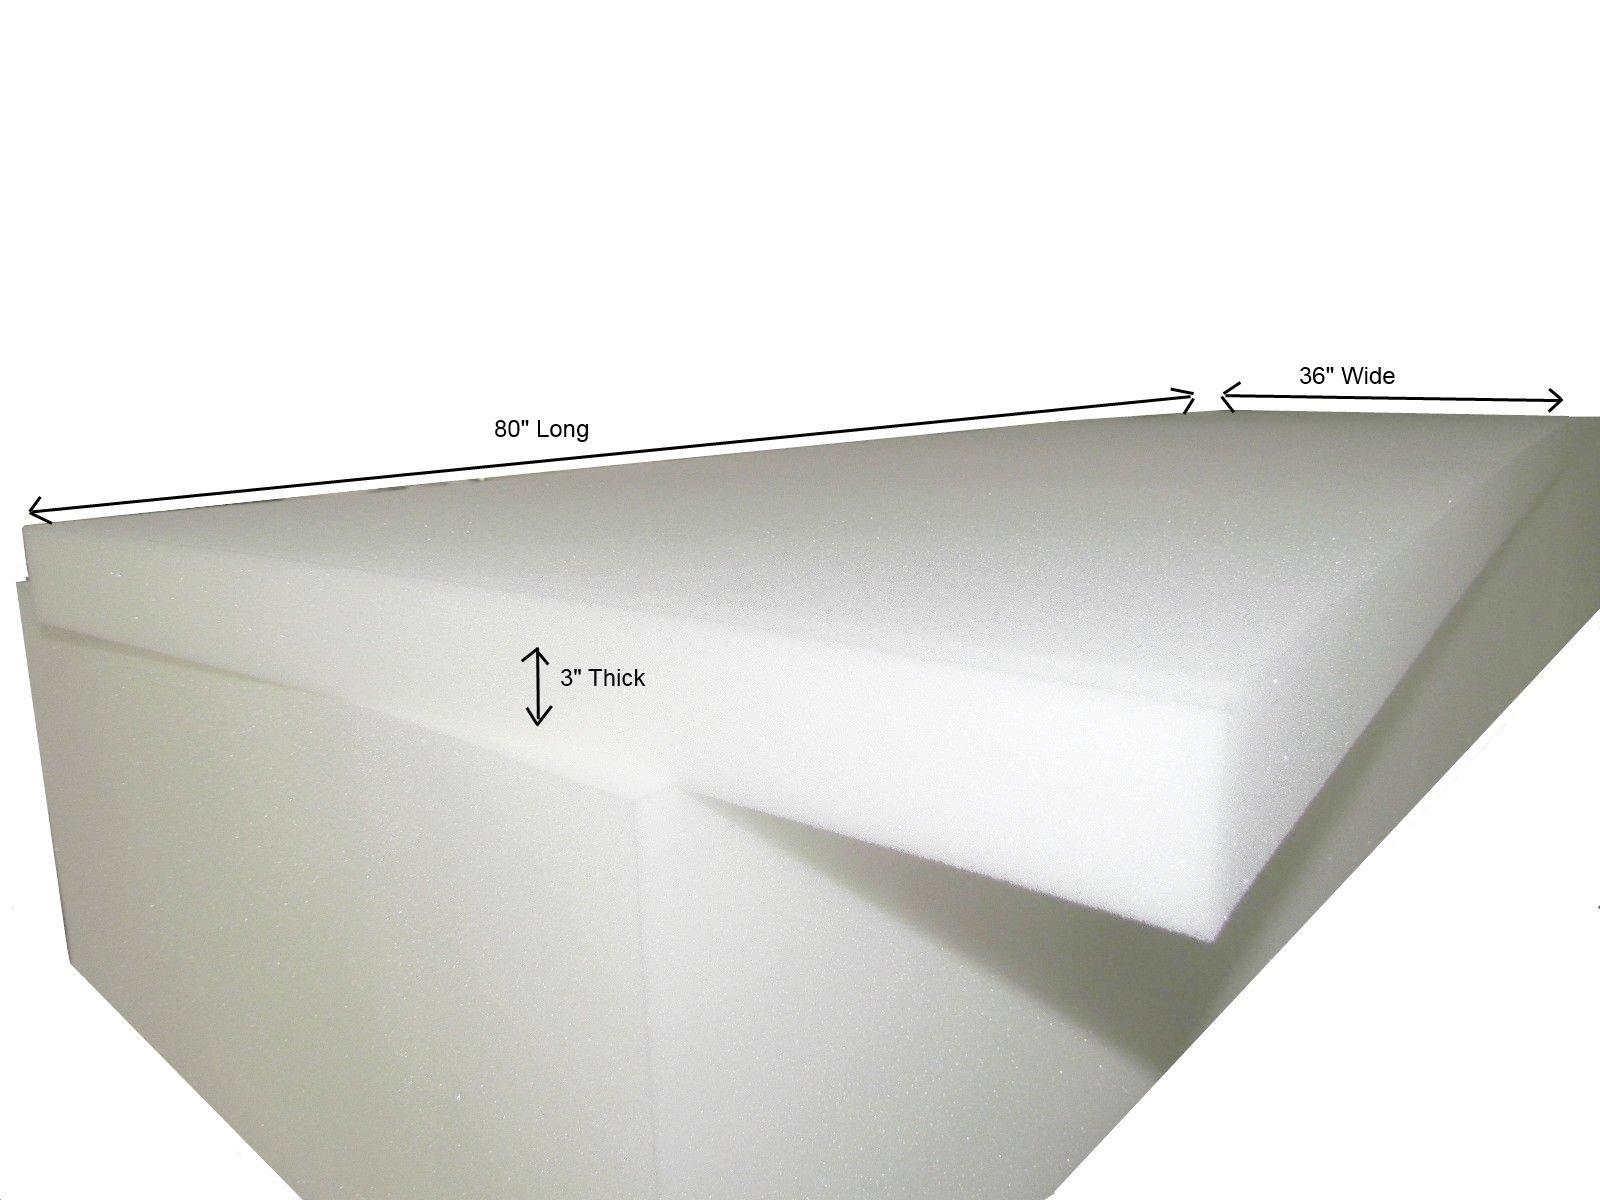 Foam Cushion 3''T x 36''W x 80''L (1536) ''Medium Firm'' Seat Replacement,Sheet Foam,Foam Padding by Isellfoam